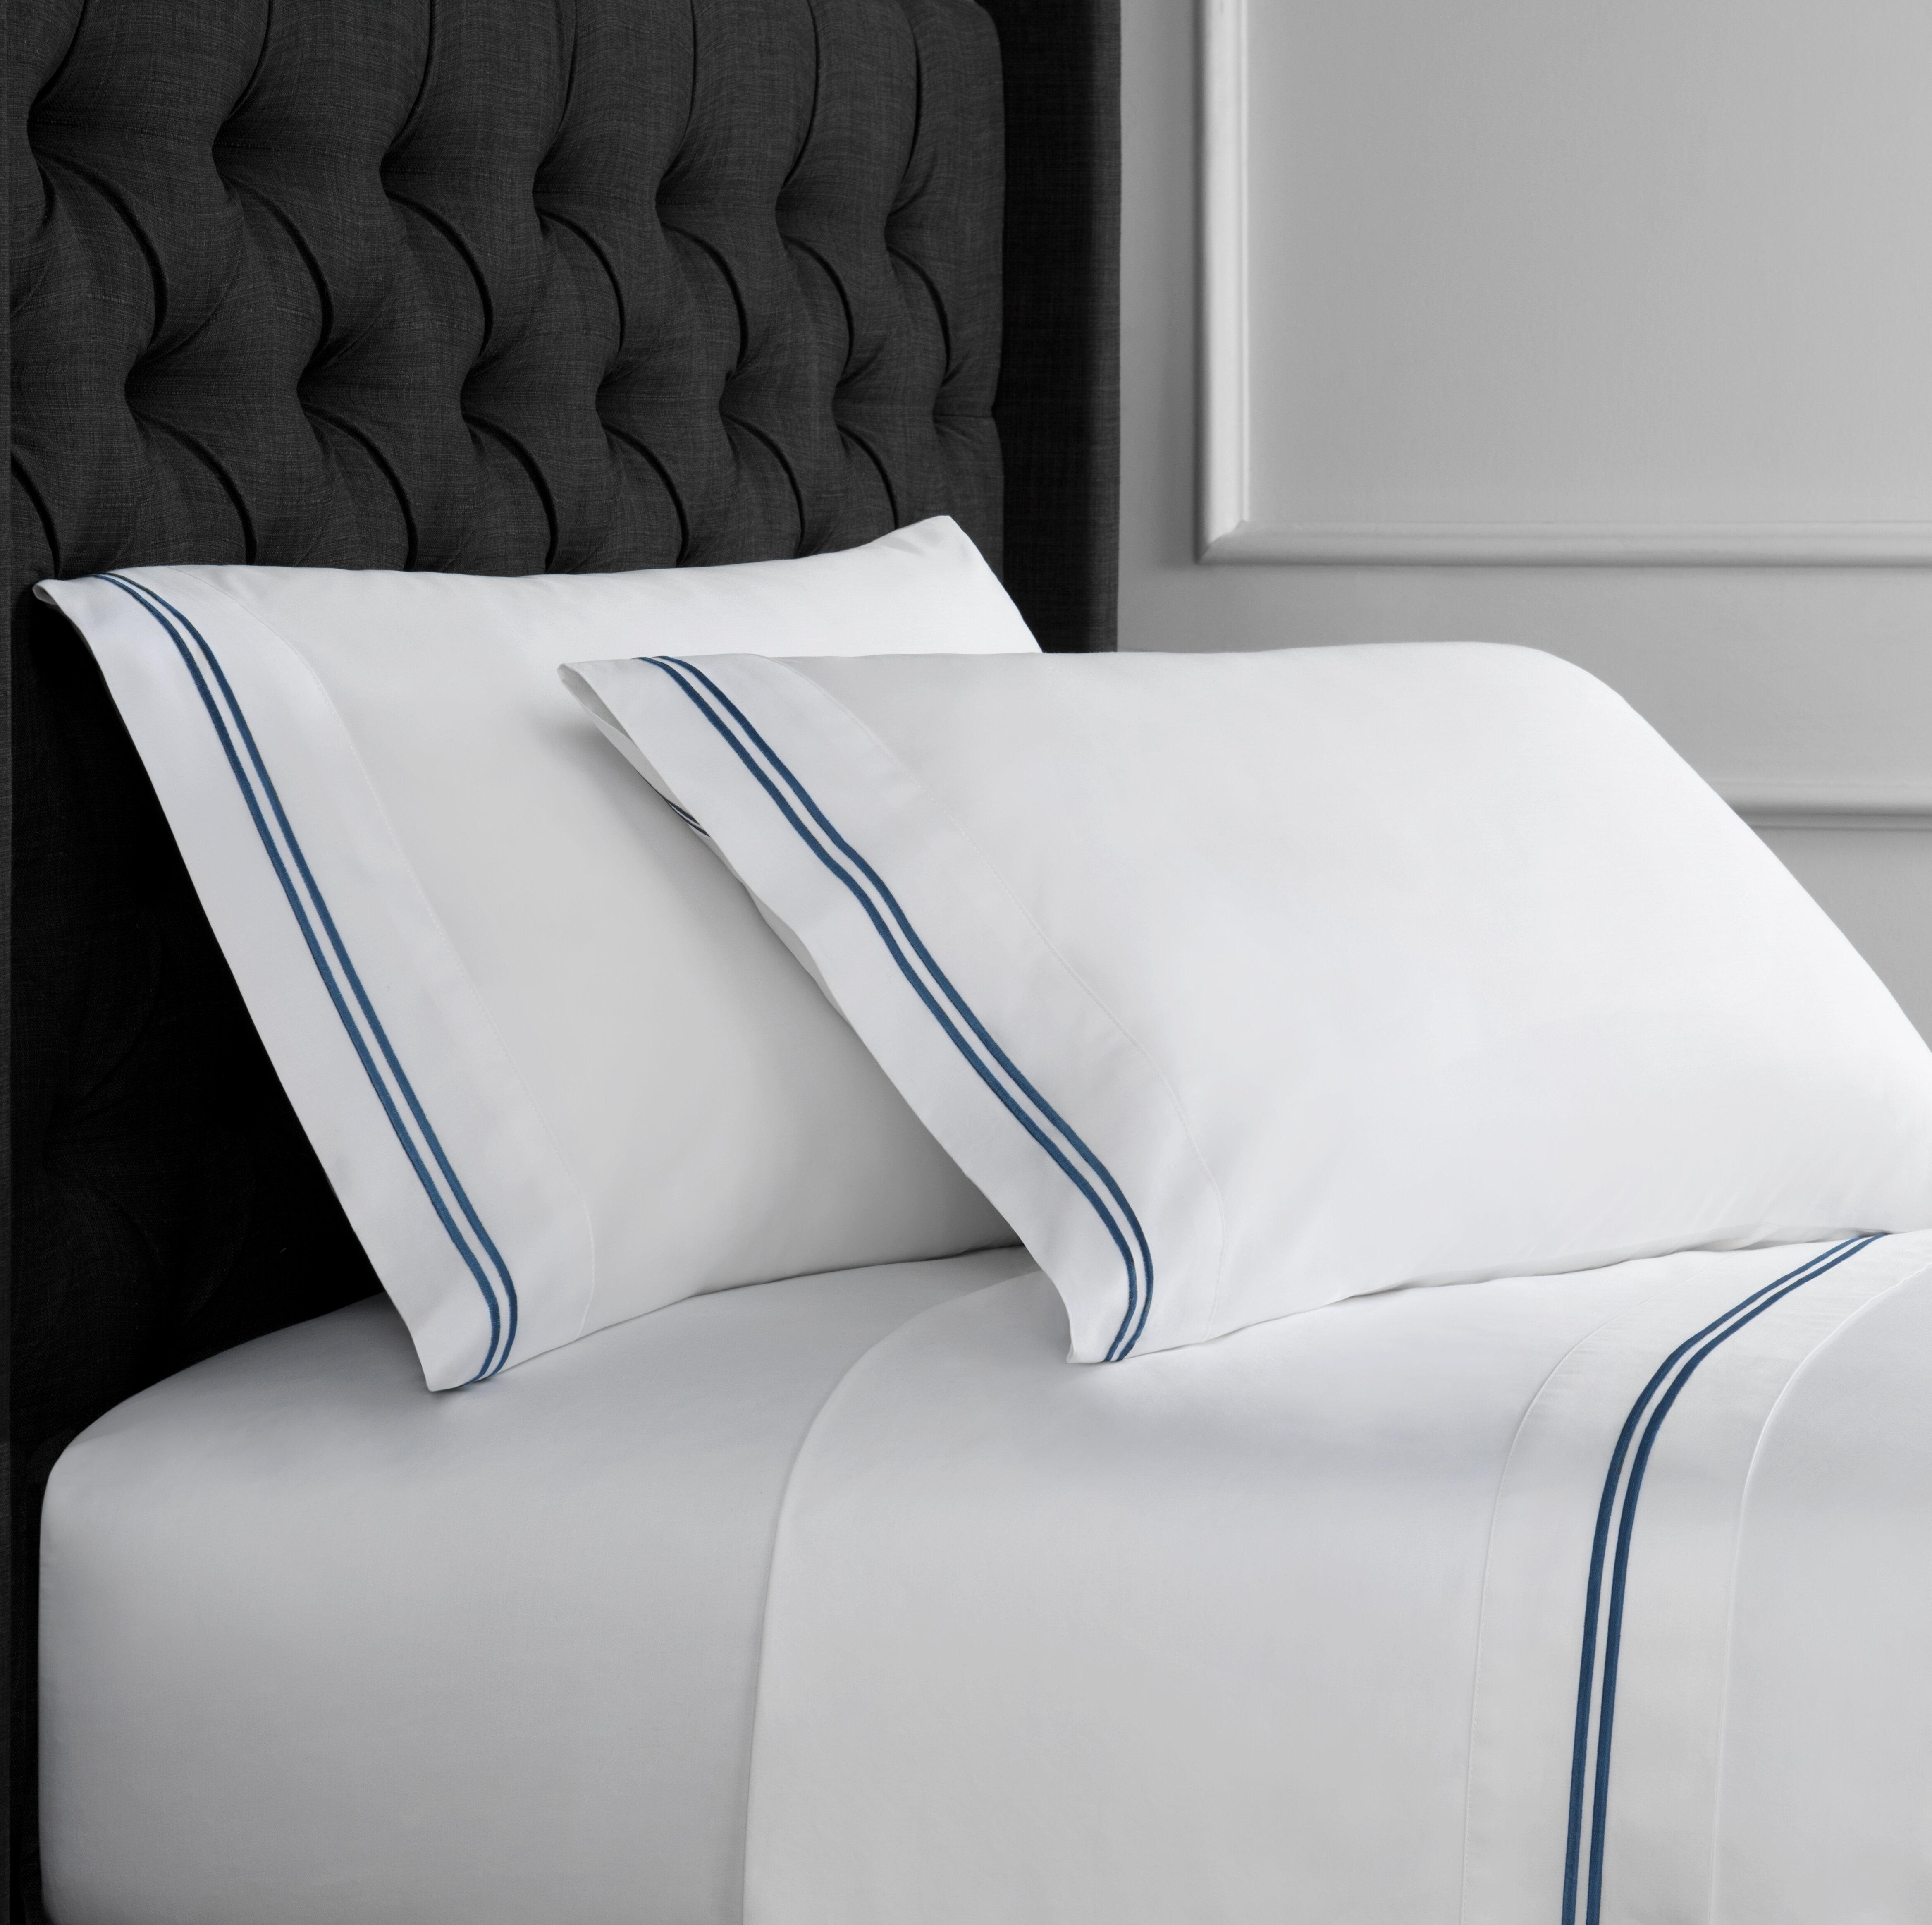 550 Up Thread Count Pillowcase Sheets Pillowcases You Ll Love In 2021 Wayfair